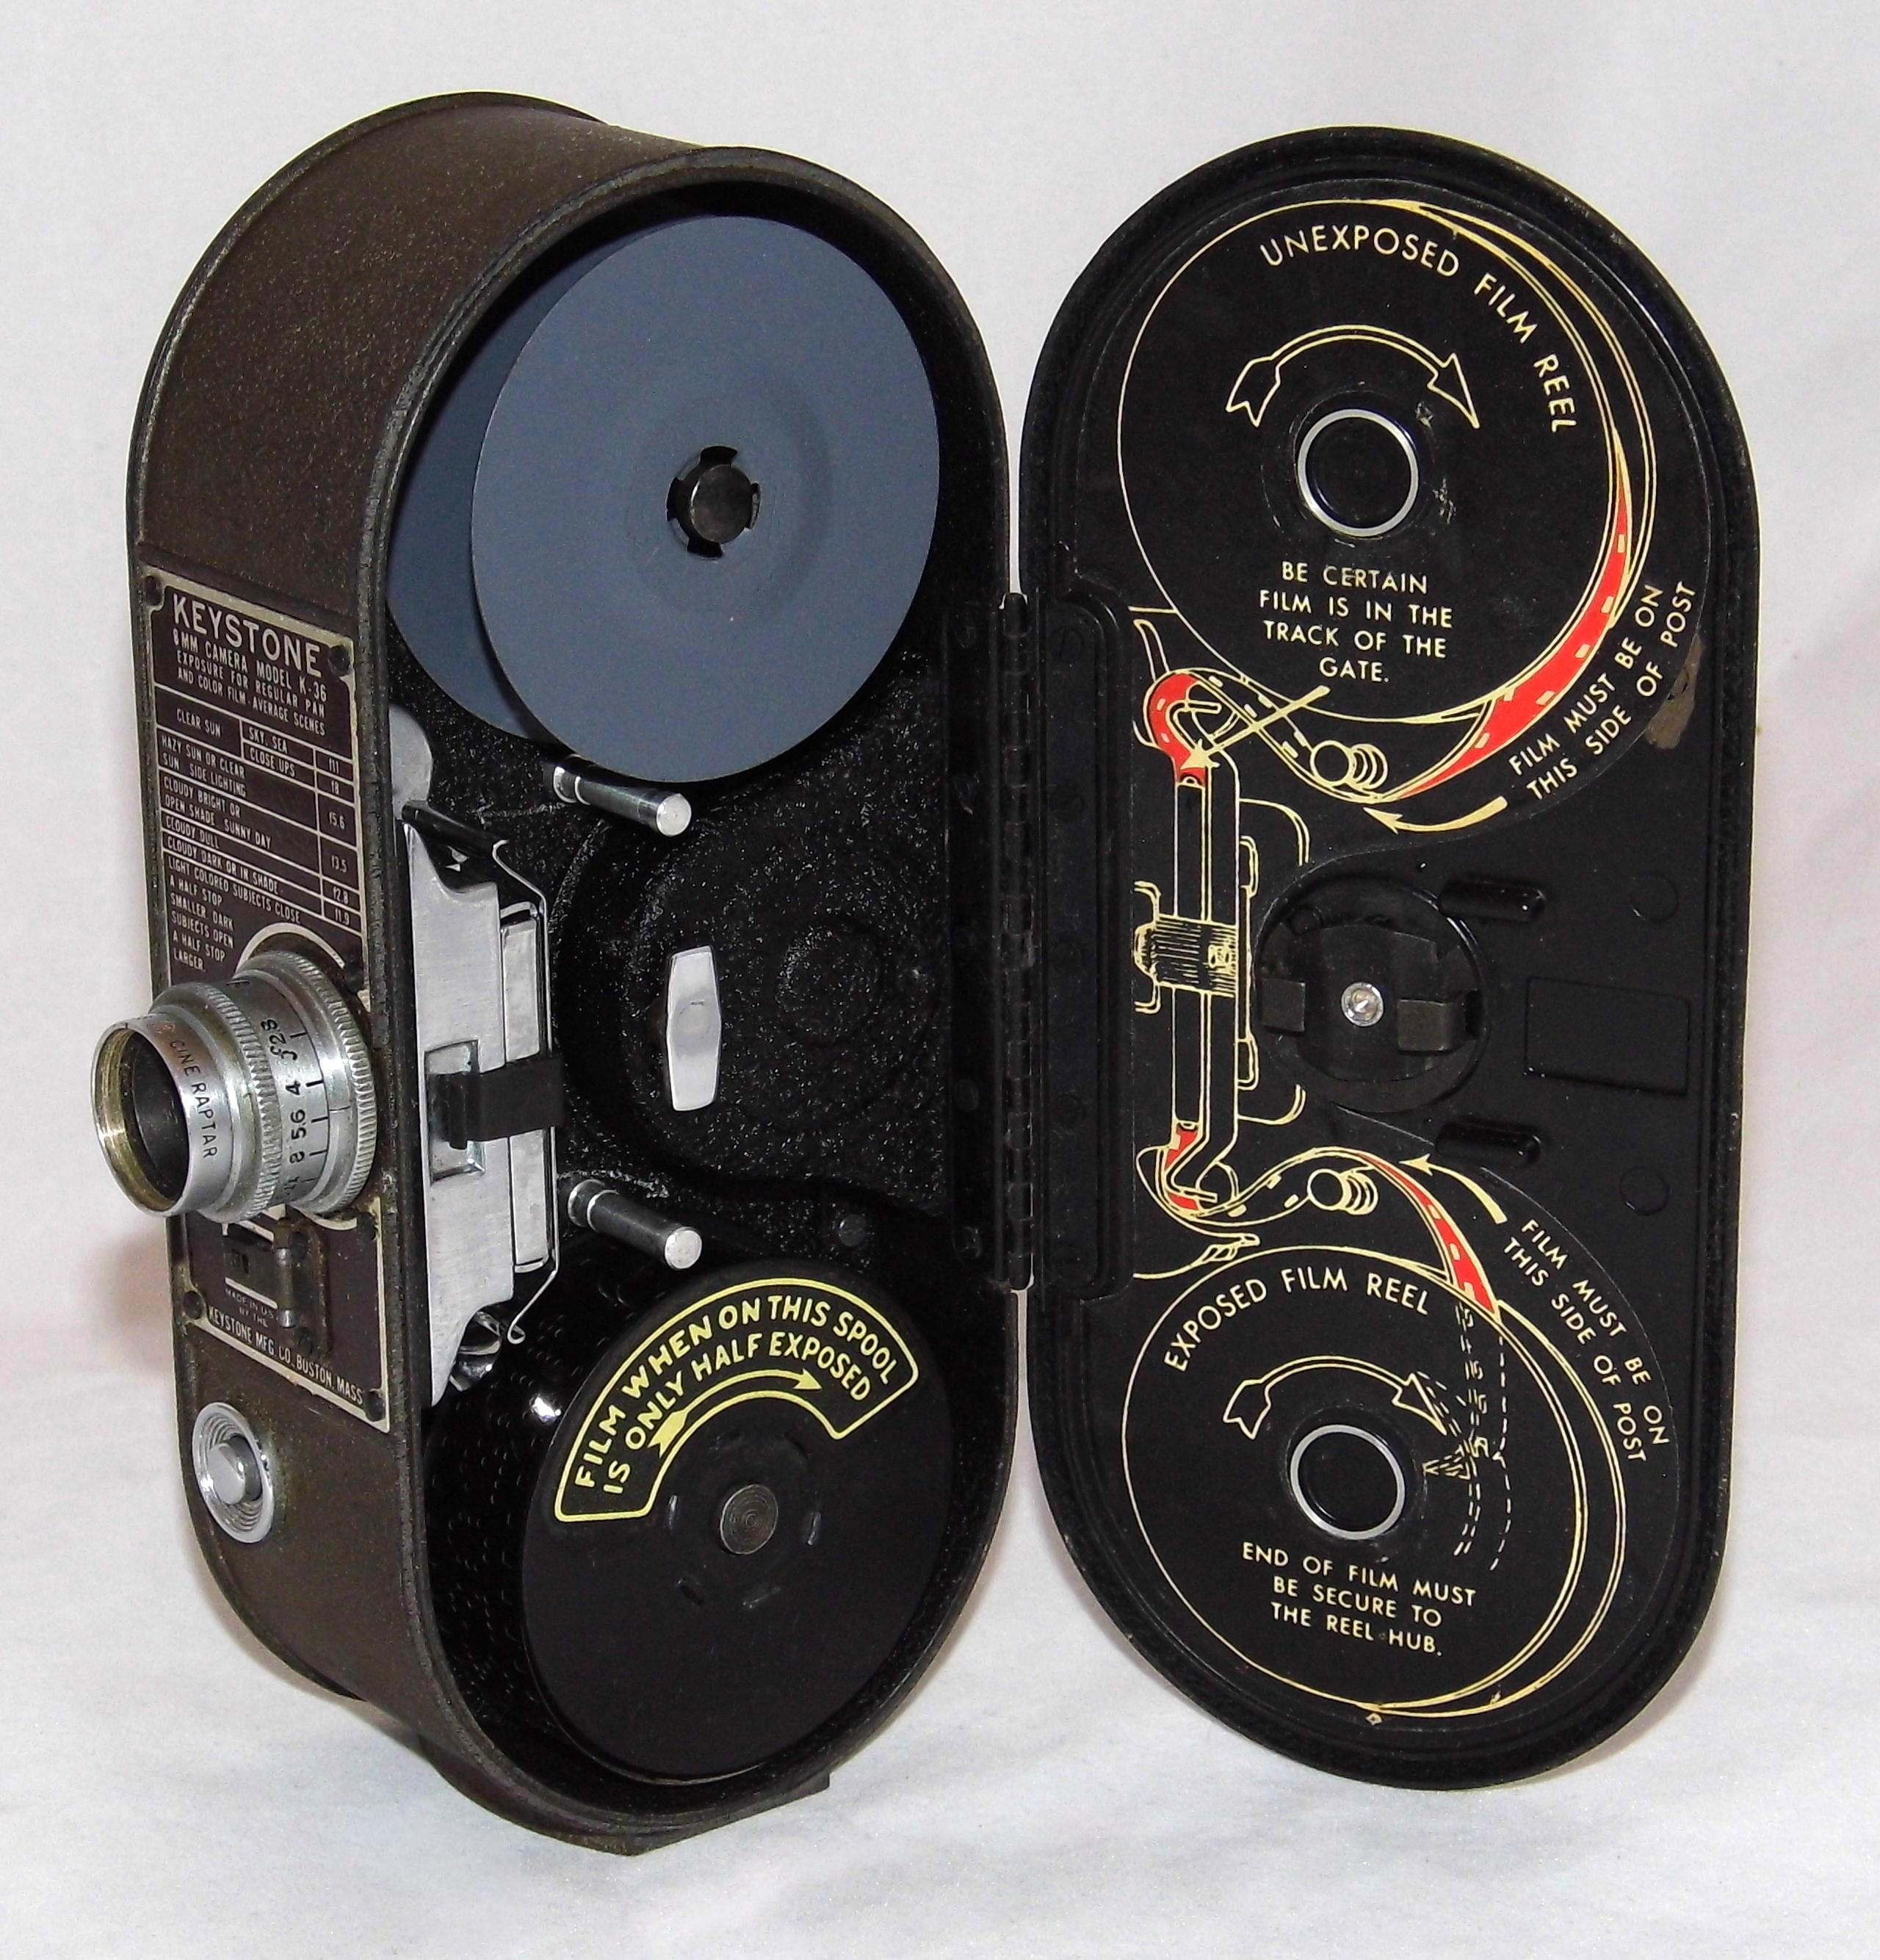 filevintage keystone 8mm home movie camera model k36